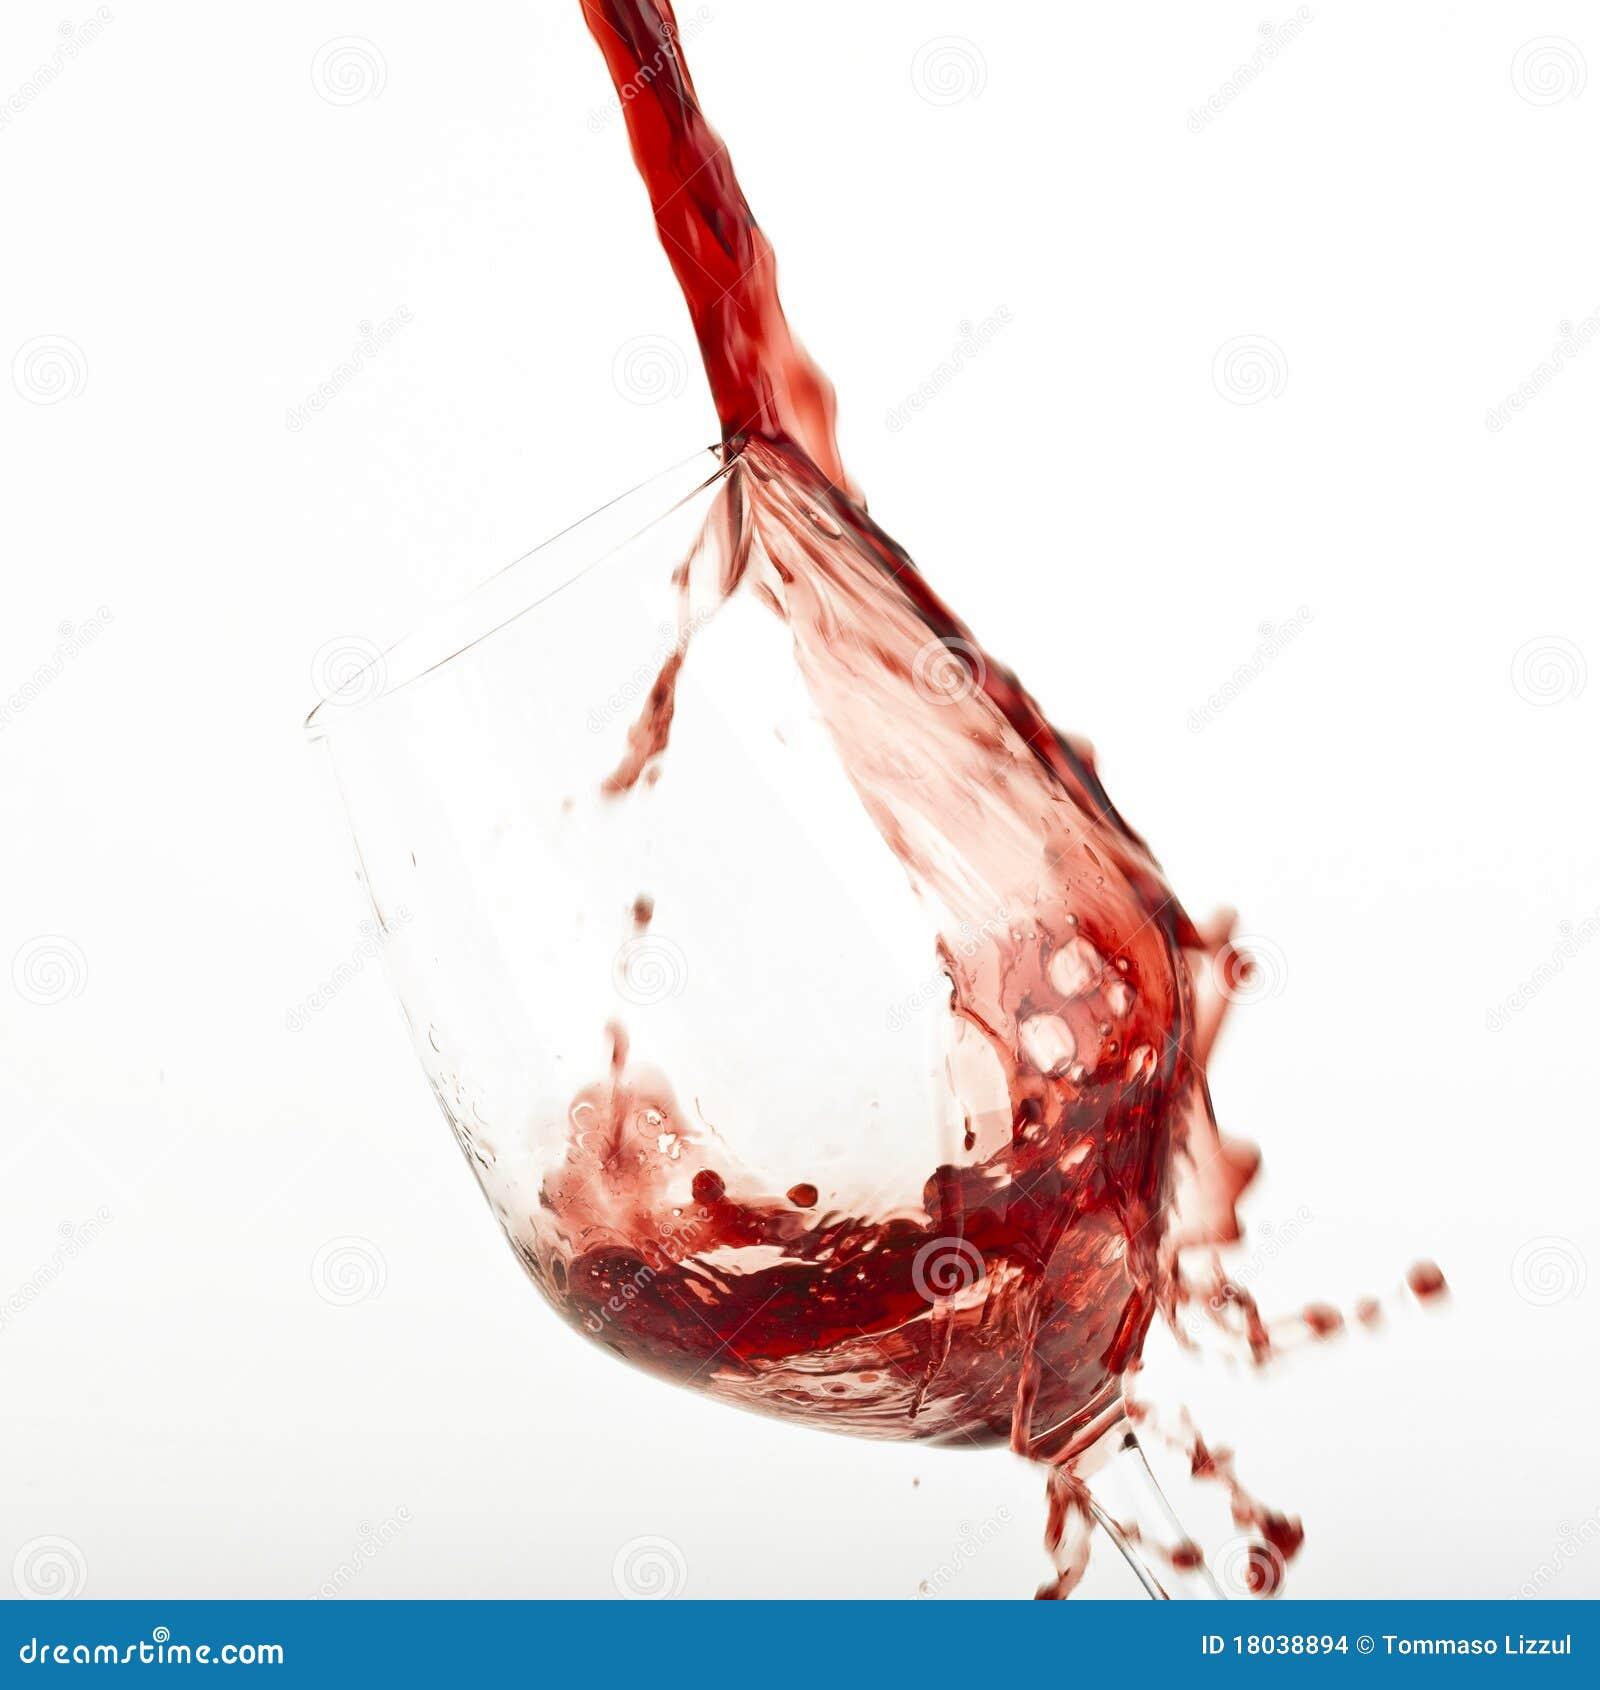 Red wine splash on a glass.